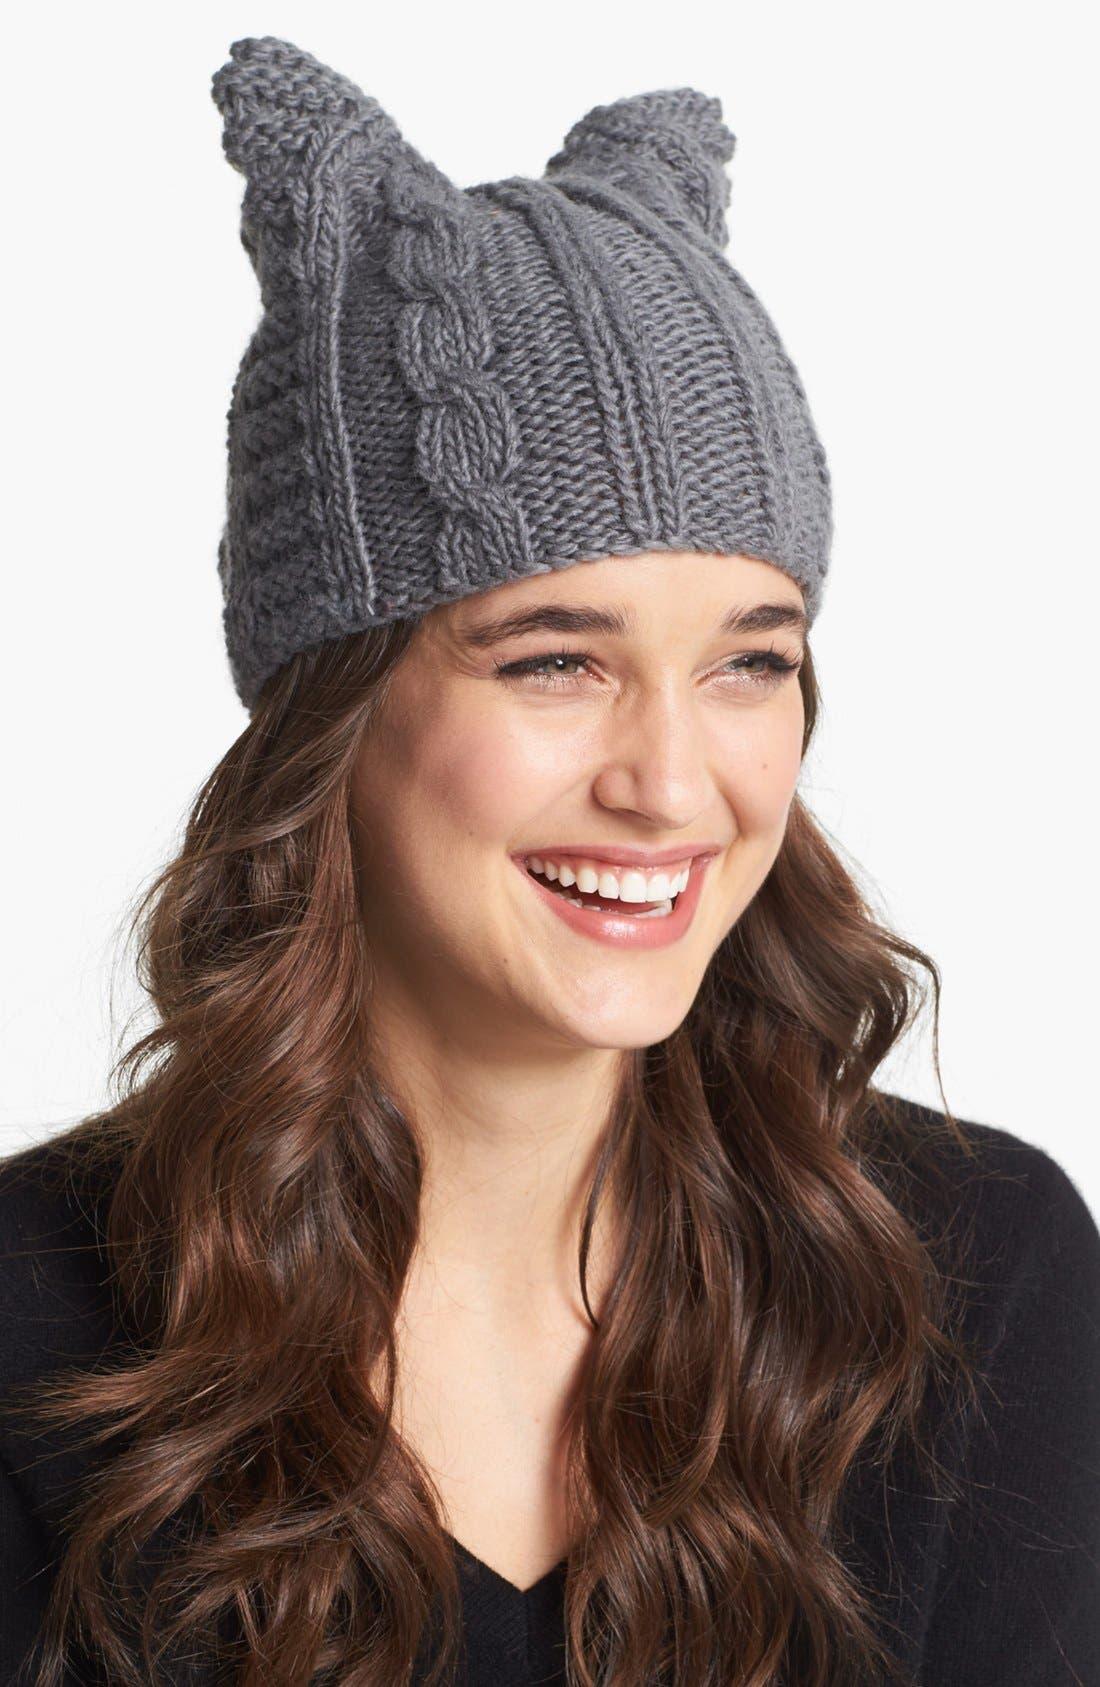 Main Image - August Hat Owl Ear Knit Cap